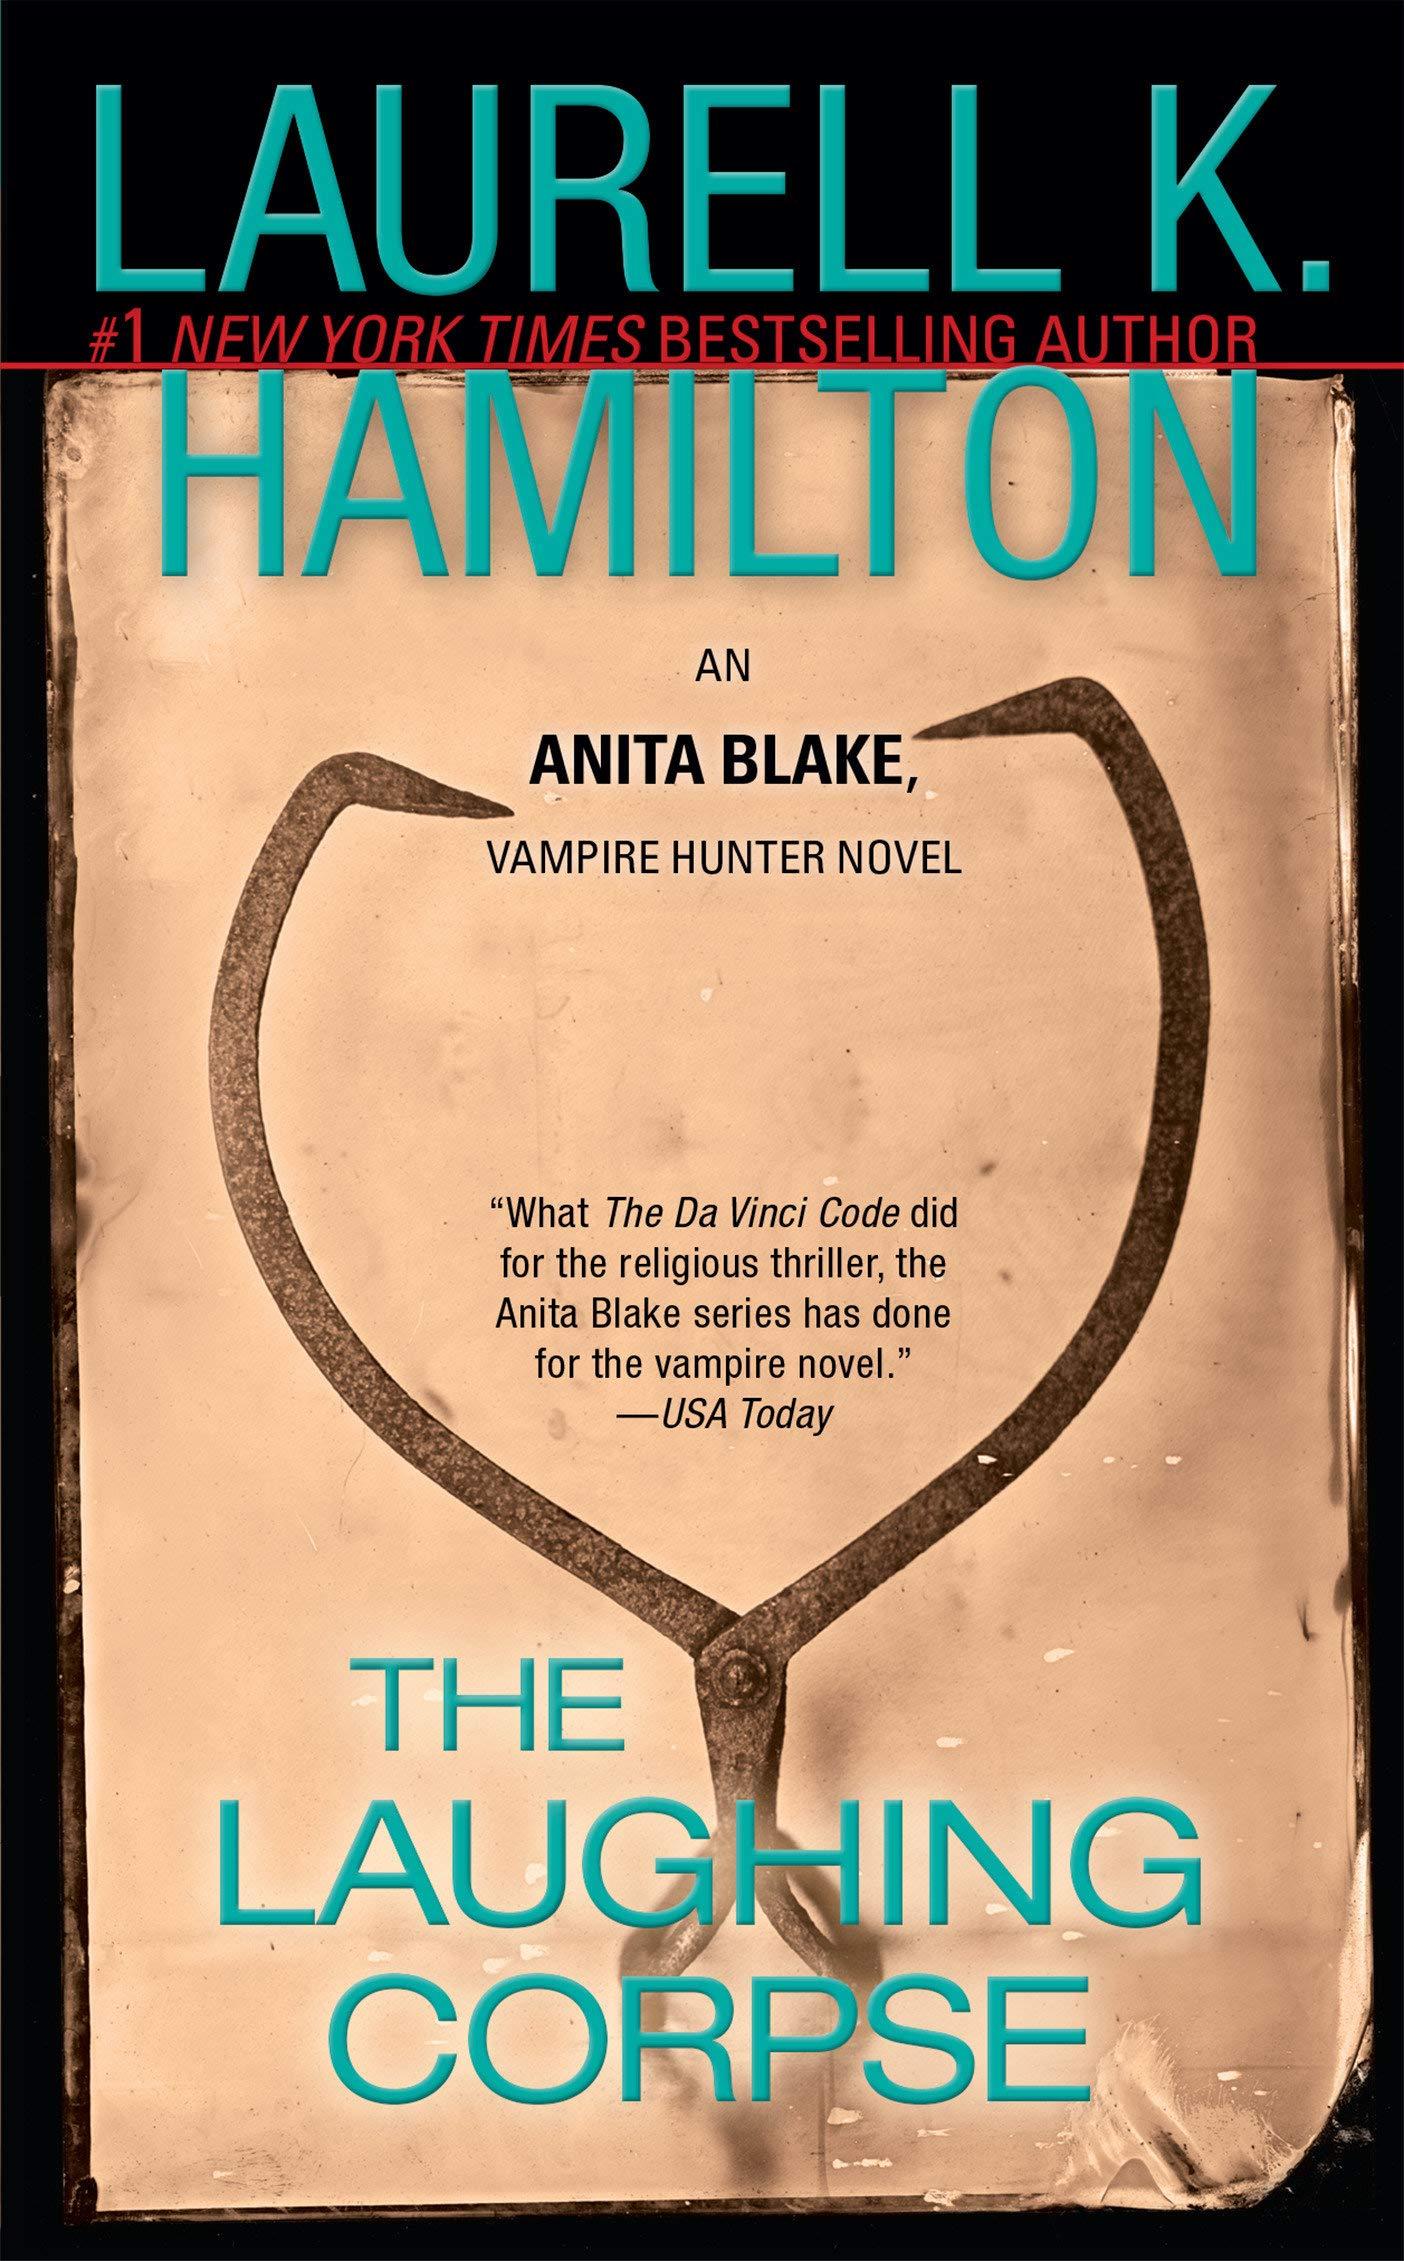 Download The Laughing Corpse Anita Blake Vampire Hunter 2 By Laurell K Hamilton